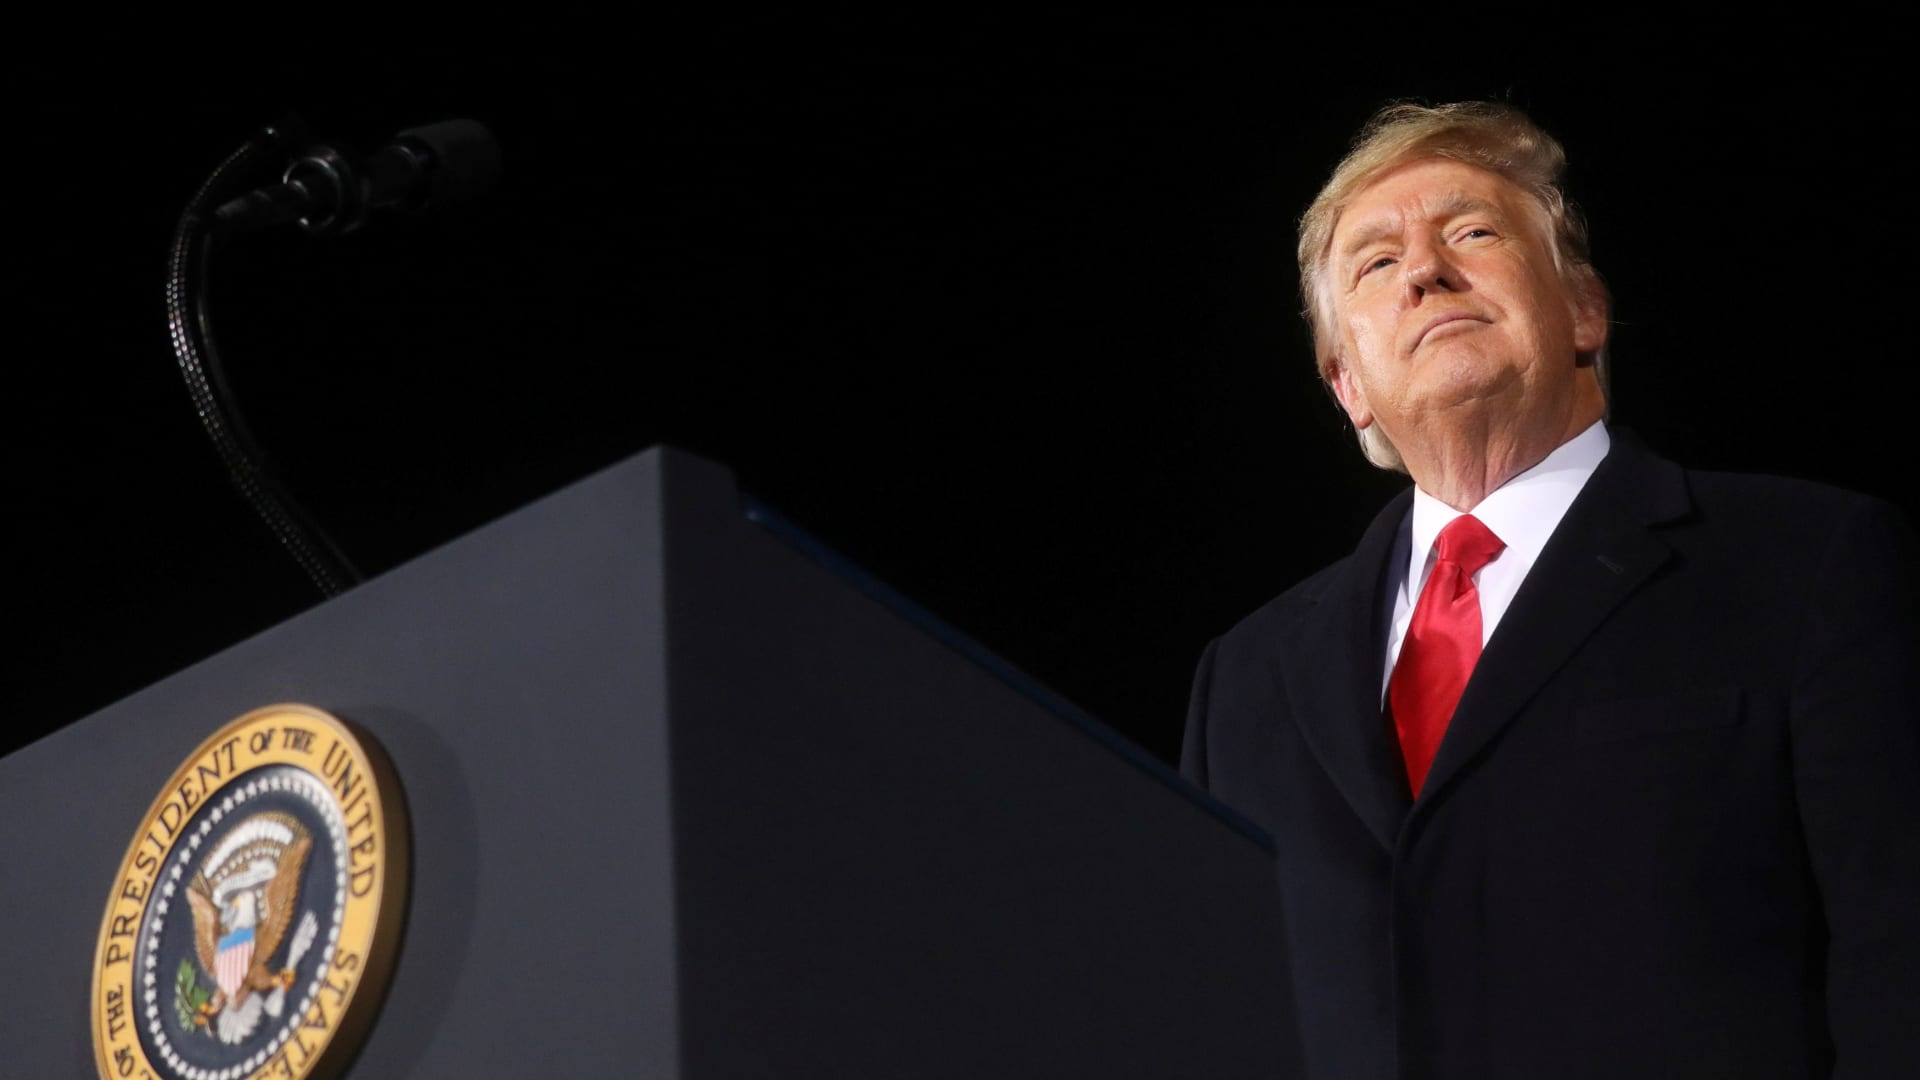 U.S. President Donald Trump addresses a campaign rally in Dalton, Georgia, U.S., on the eve of the run-off election to decide both of Georgia's Senate seats January 4, 2021.